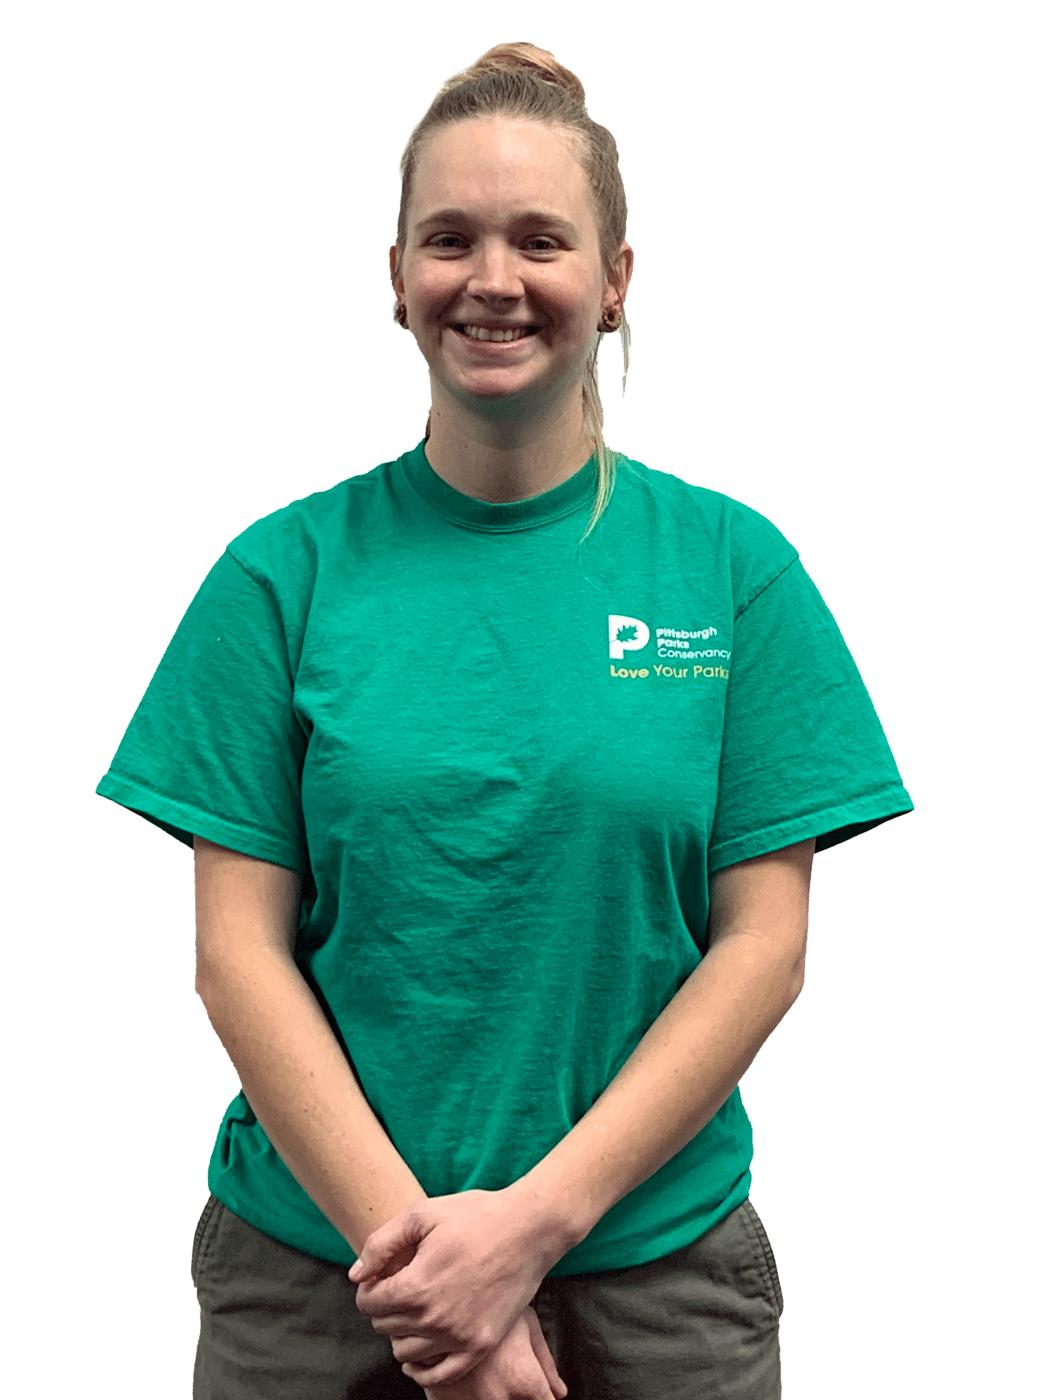 PPC Staff member Maggie